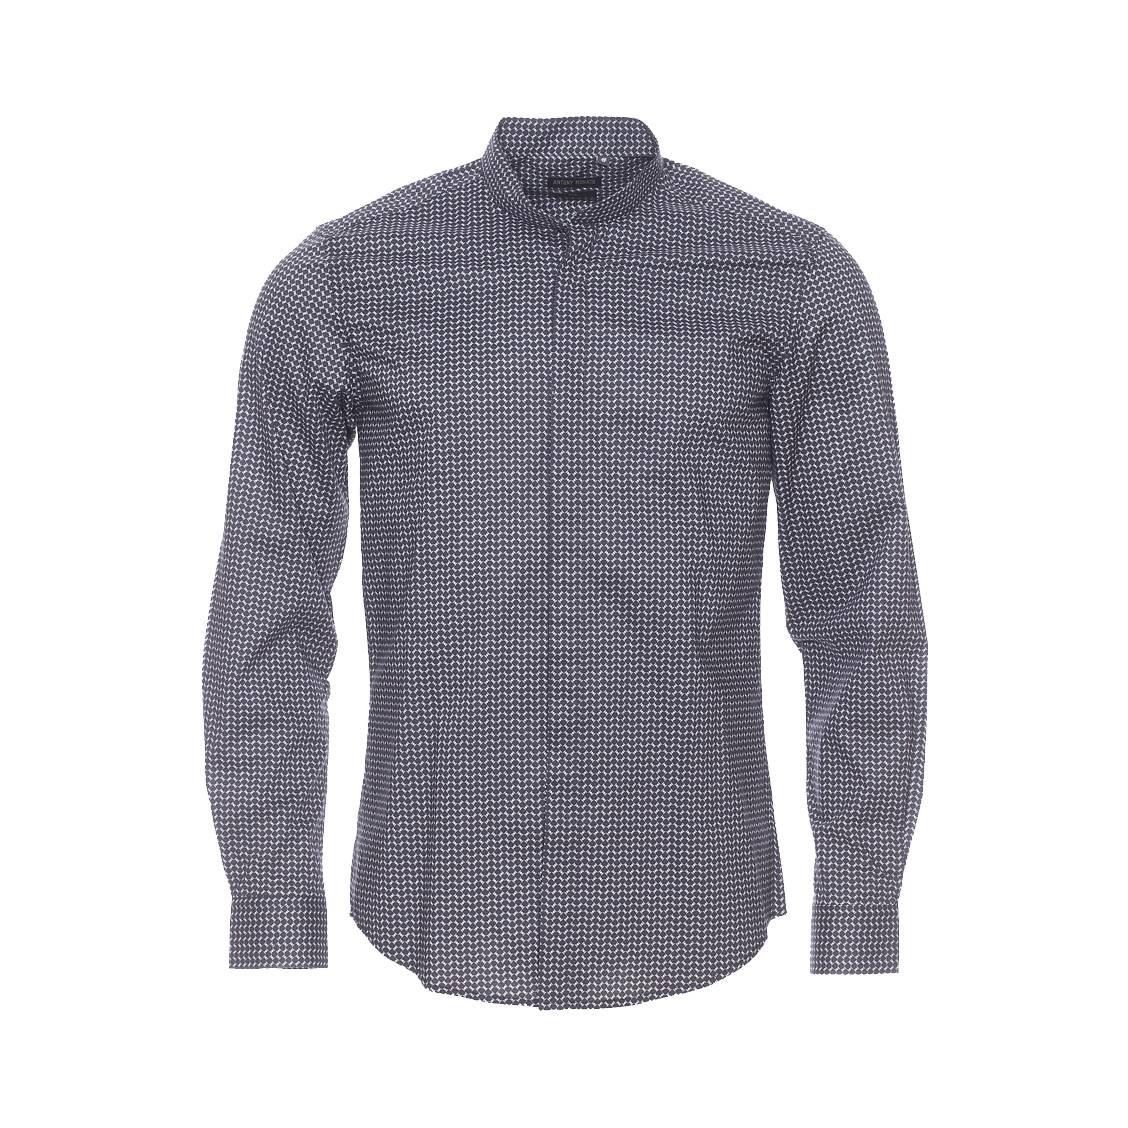 chemise col mao homme jusqu 85 soldes deuxi me d marque. Black Bedroom Furniture Sets. Home Design Ideas